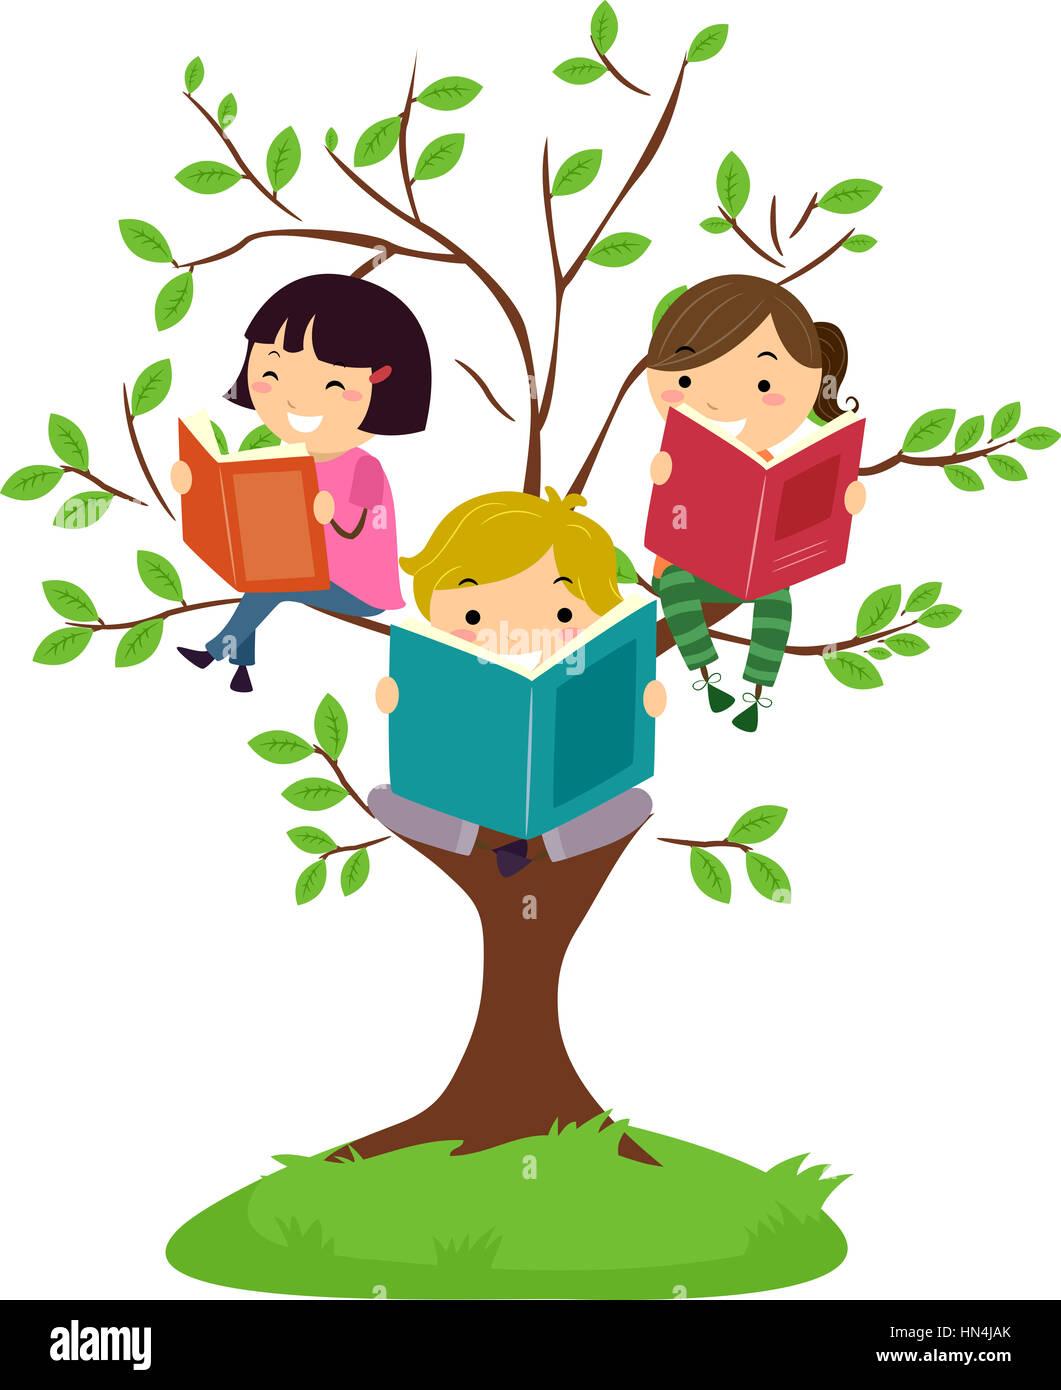 stickman illustration of kids reading books while sitting